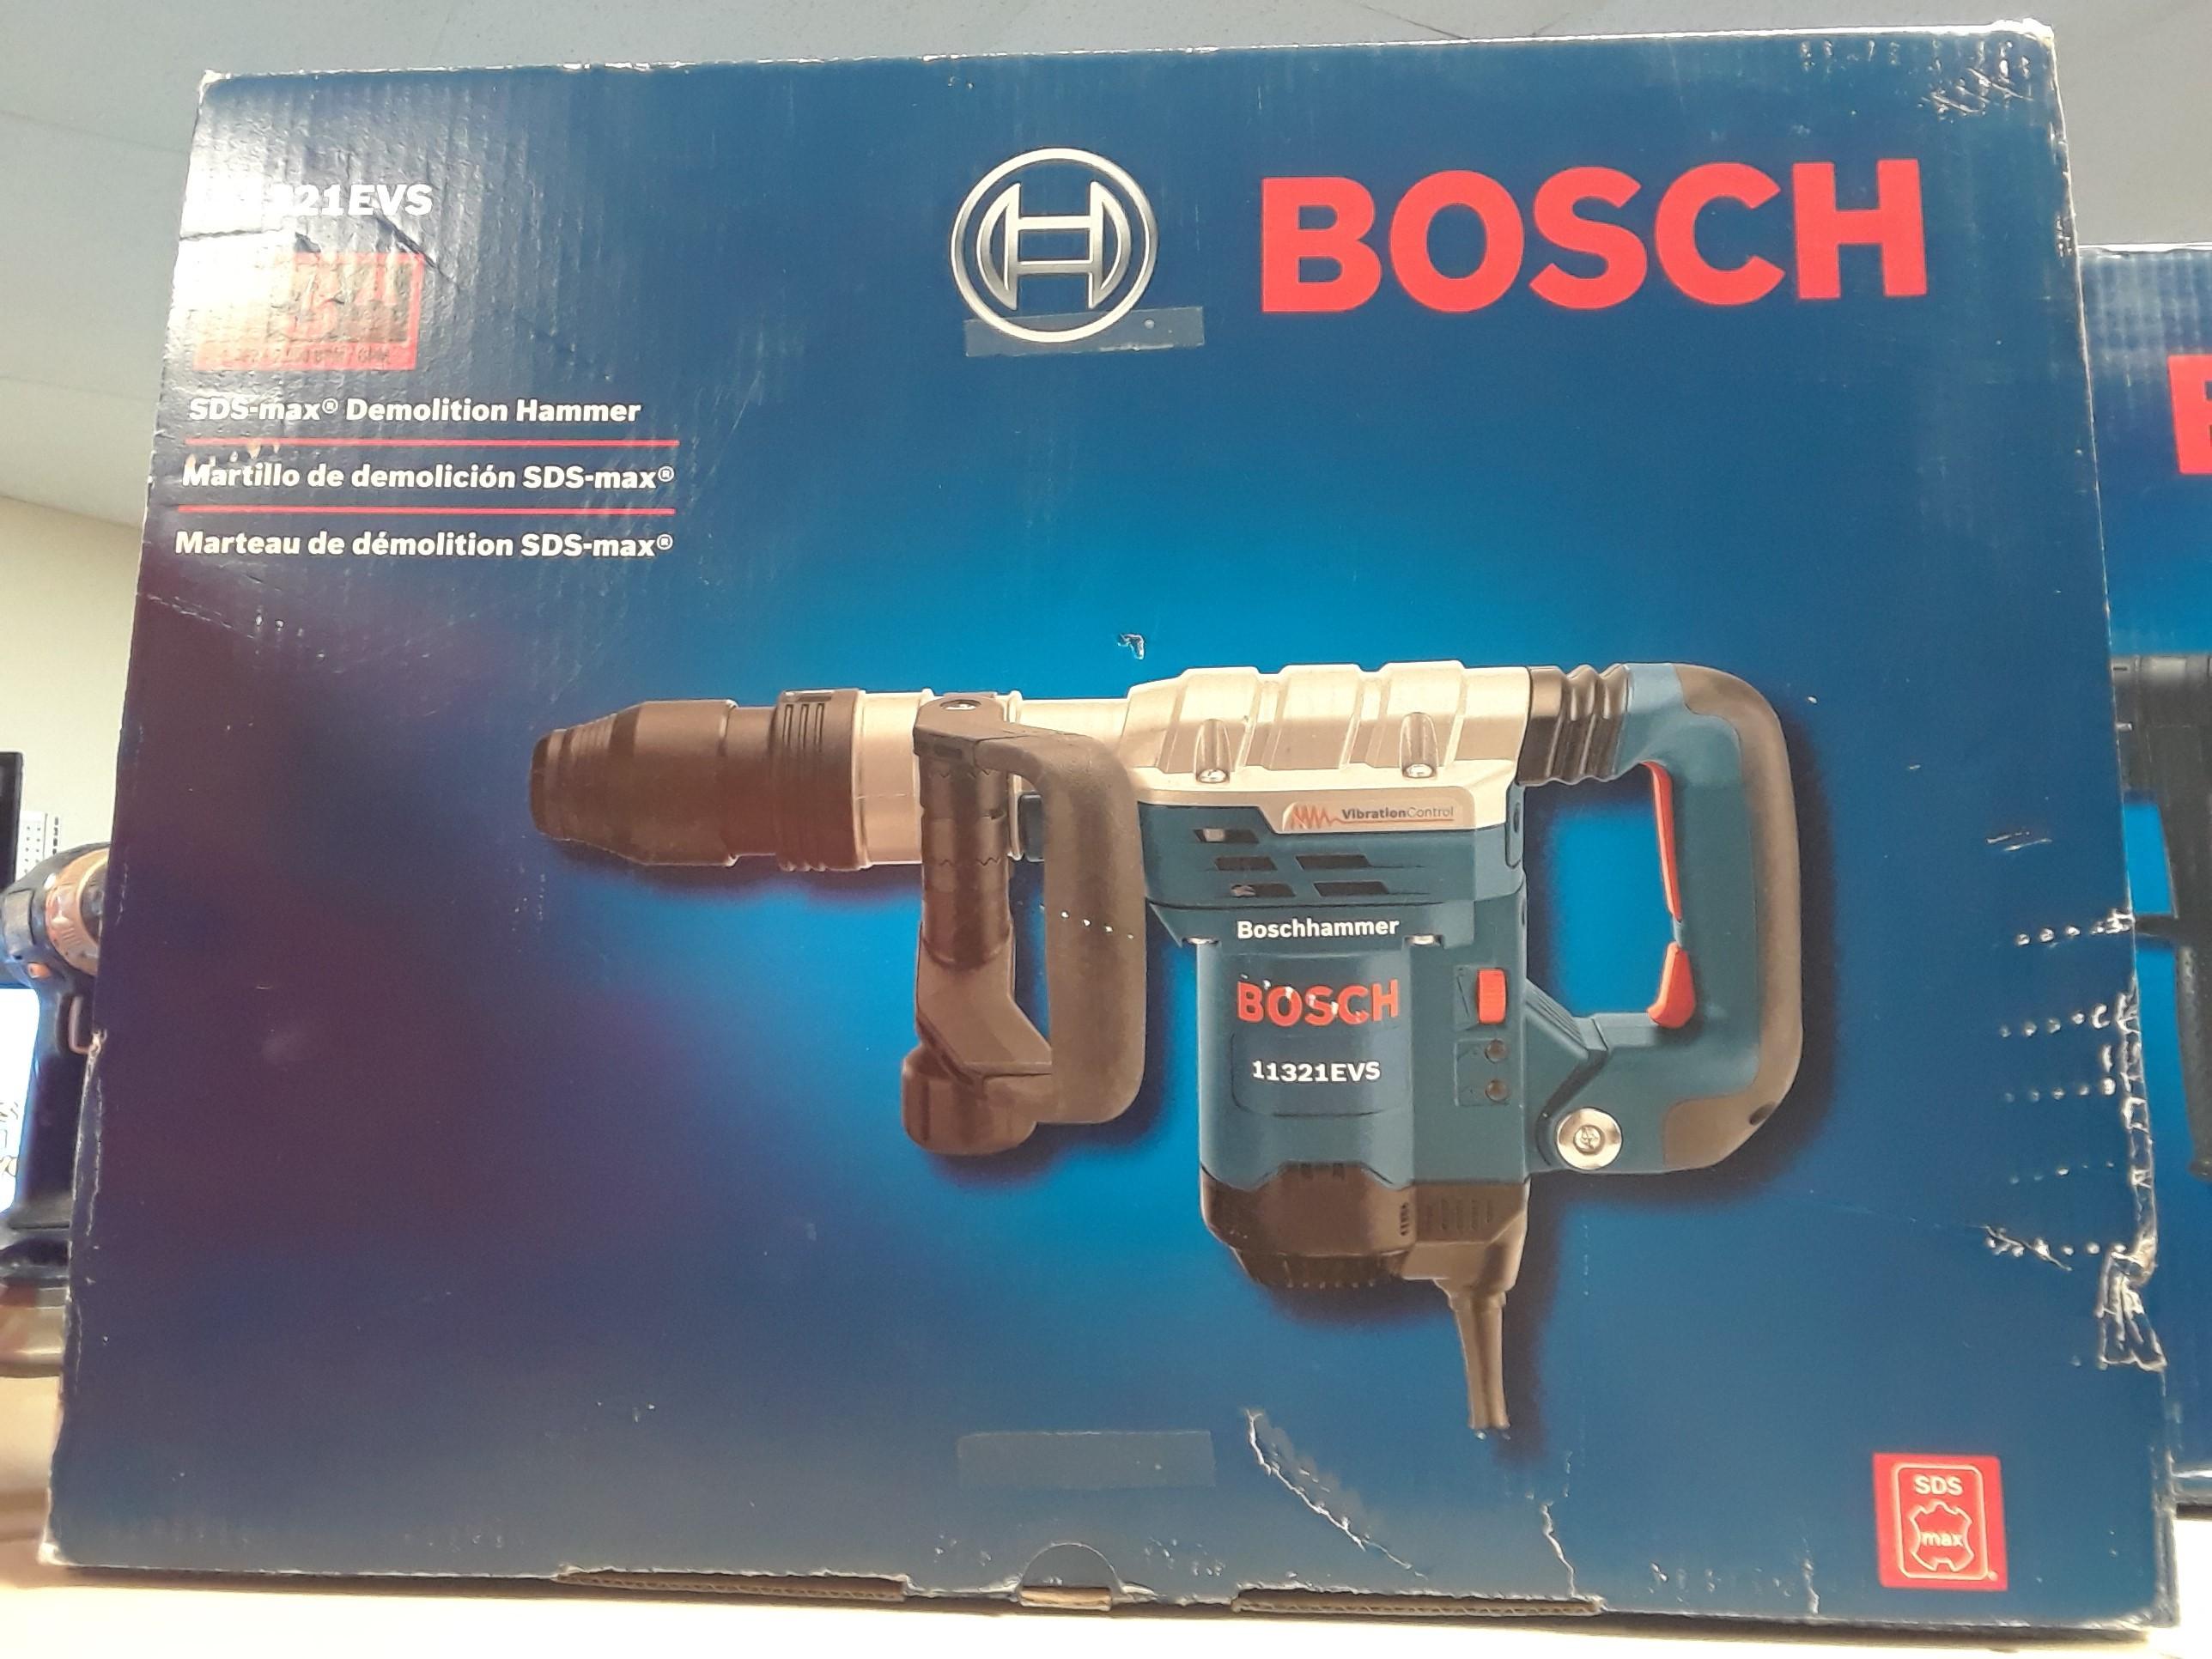 BOSCH DEMO HAMMER- MODEL: 11321EVS